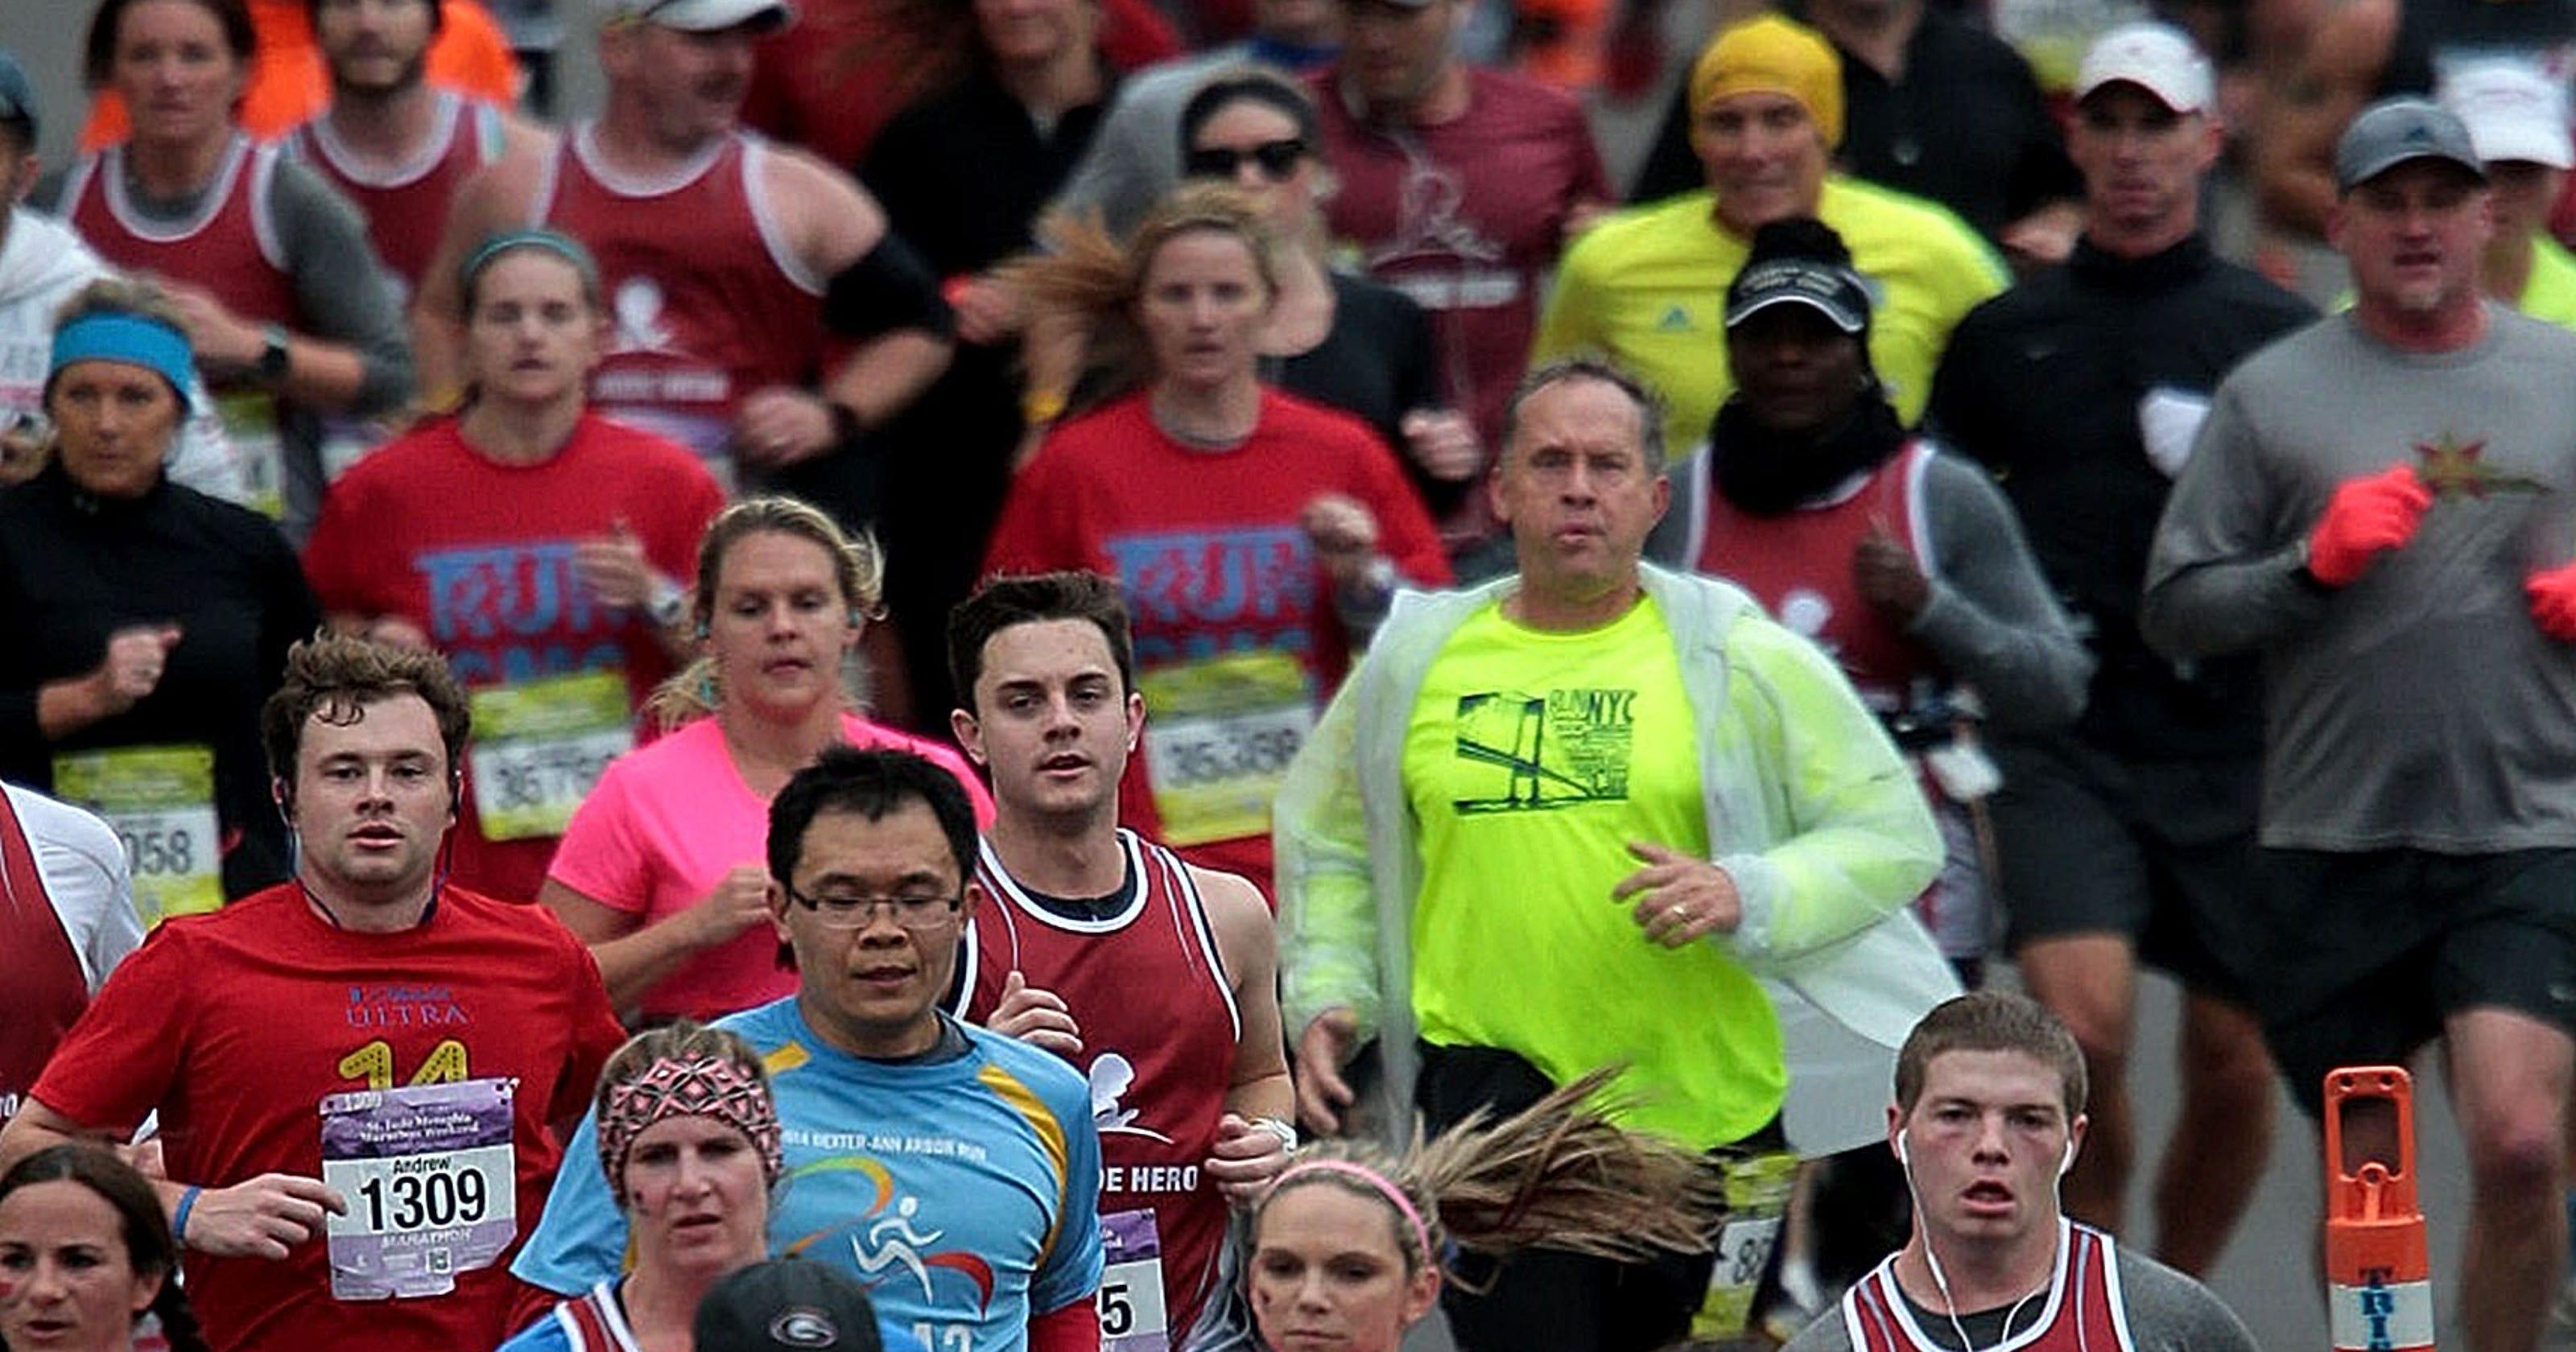 Complete St  Jude Memphis Half-Marathon results